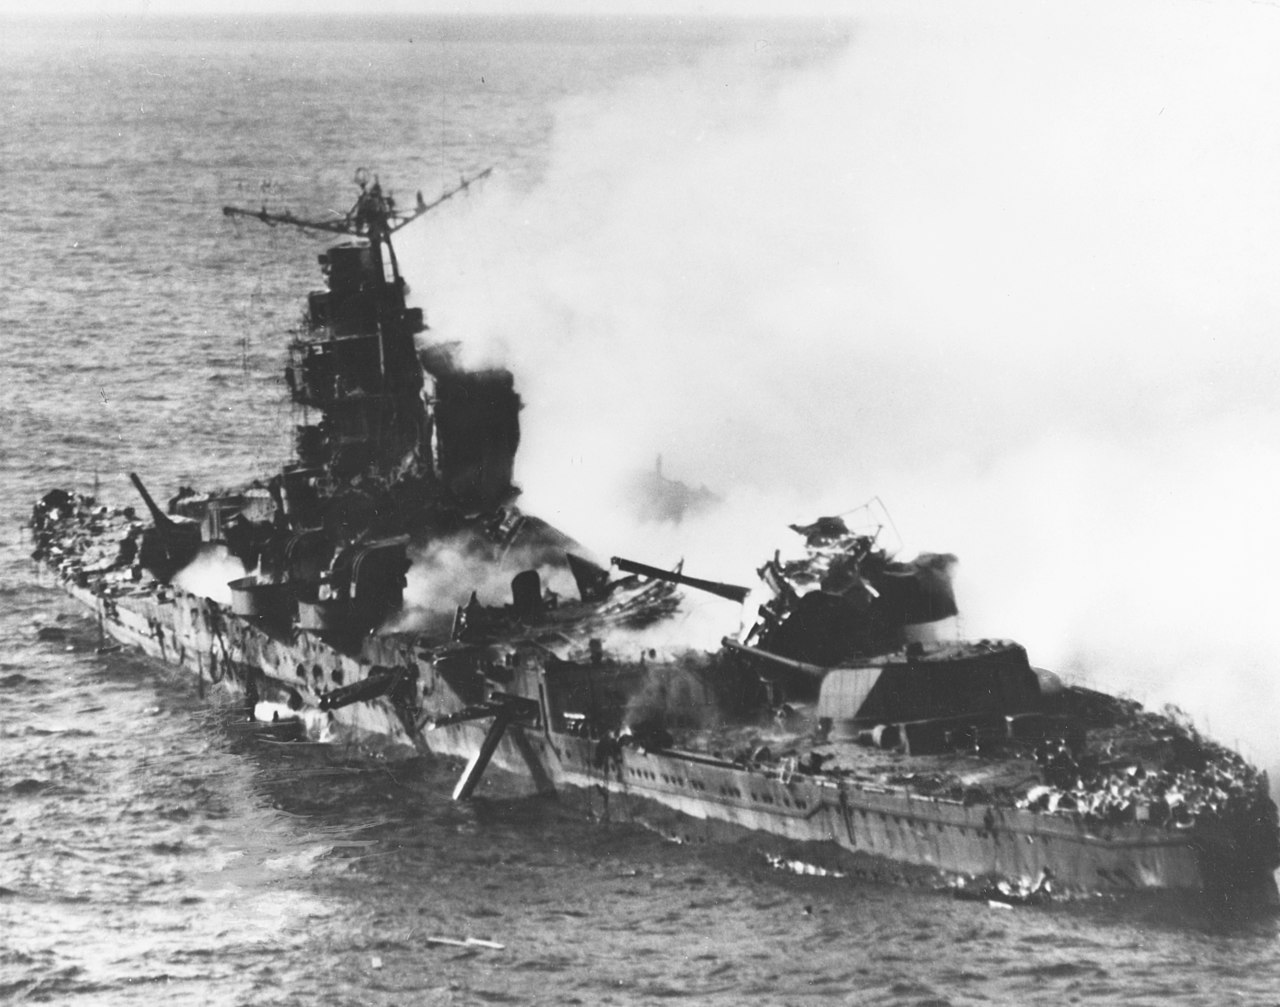 1280px-Japanese_heavy_cruiser_Mikuma_sinking_on_6_June_1942_%2880-G-414422%29.jpg